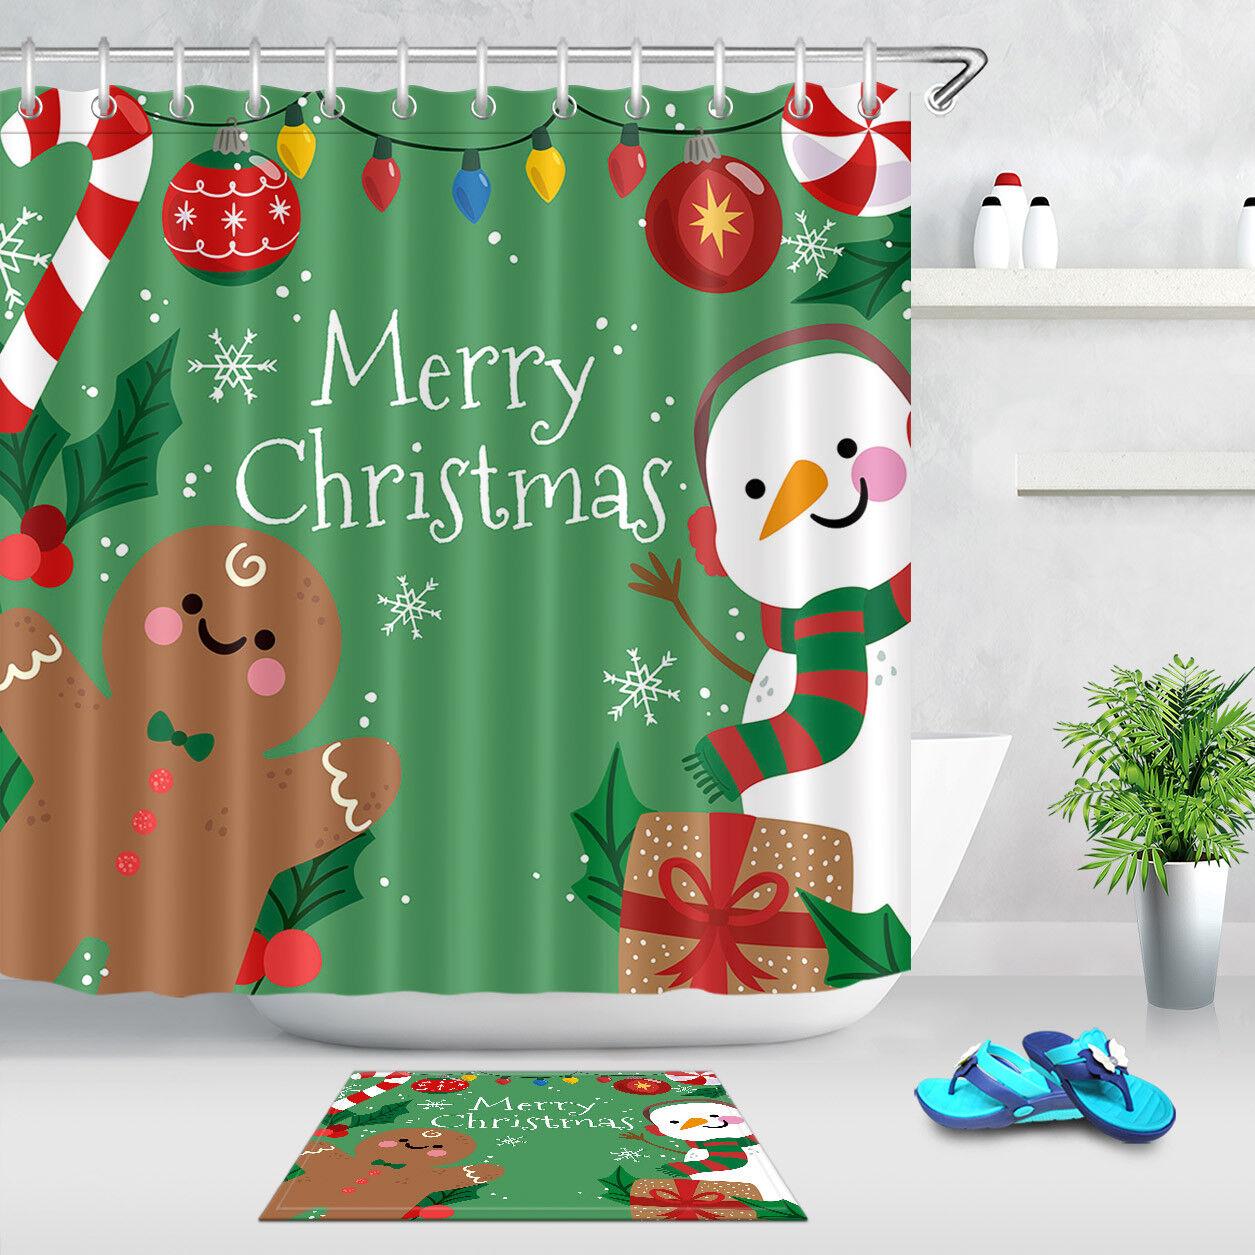 Waterproof Fabric /& 12 Hooks Shower Curtain Bath Mat Christmas Snowman Xmas Tree